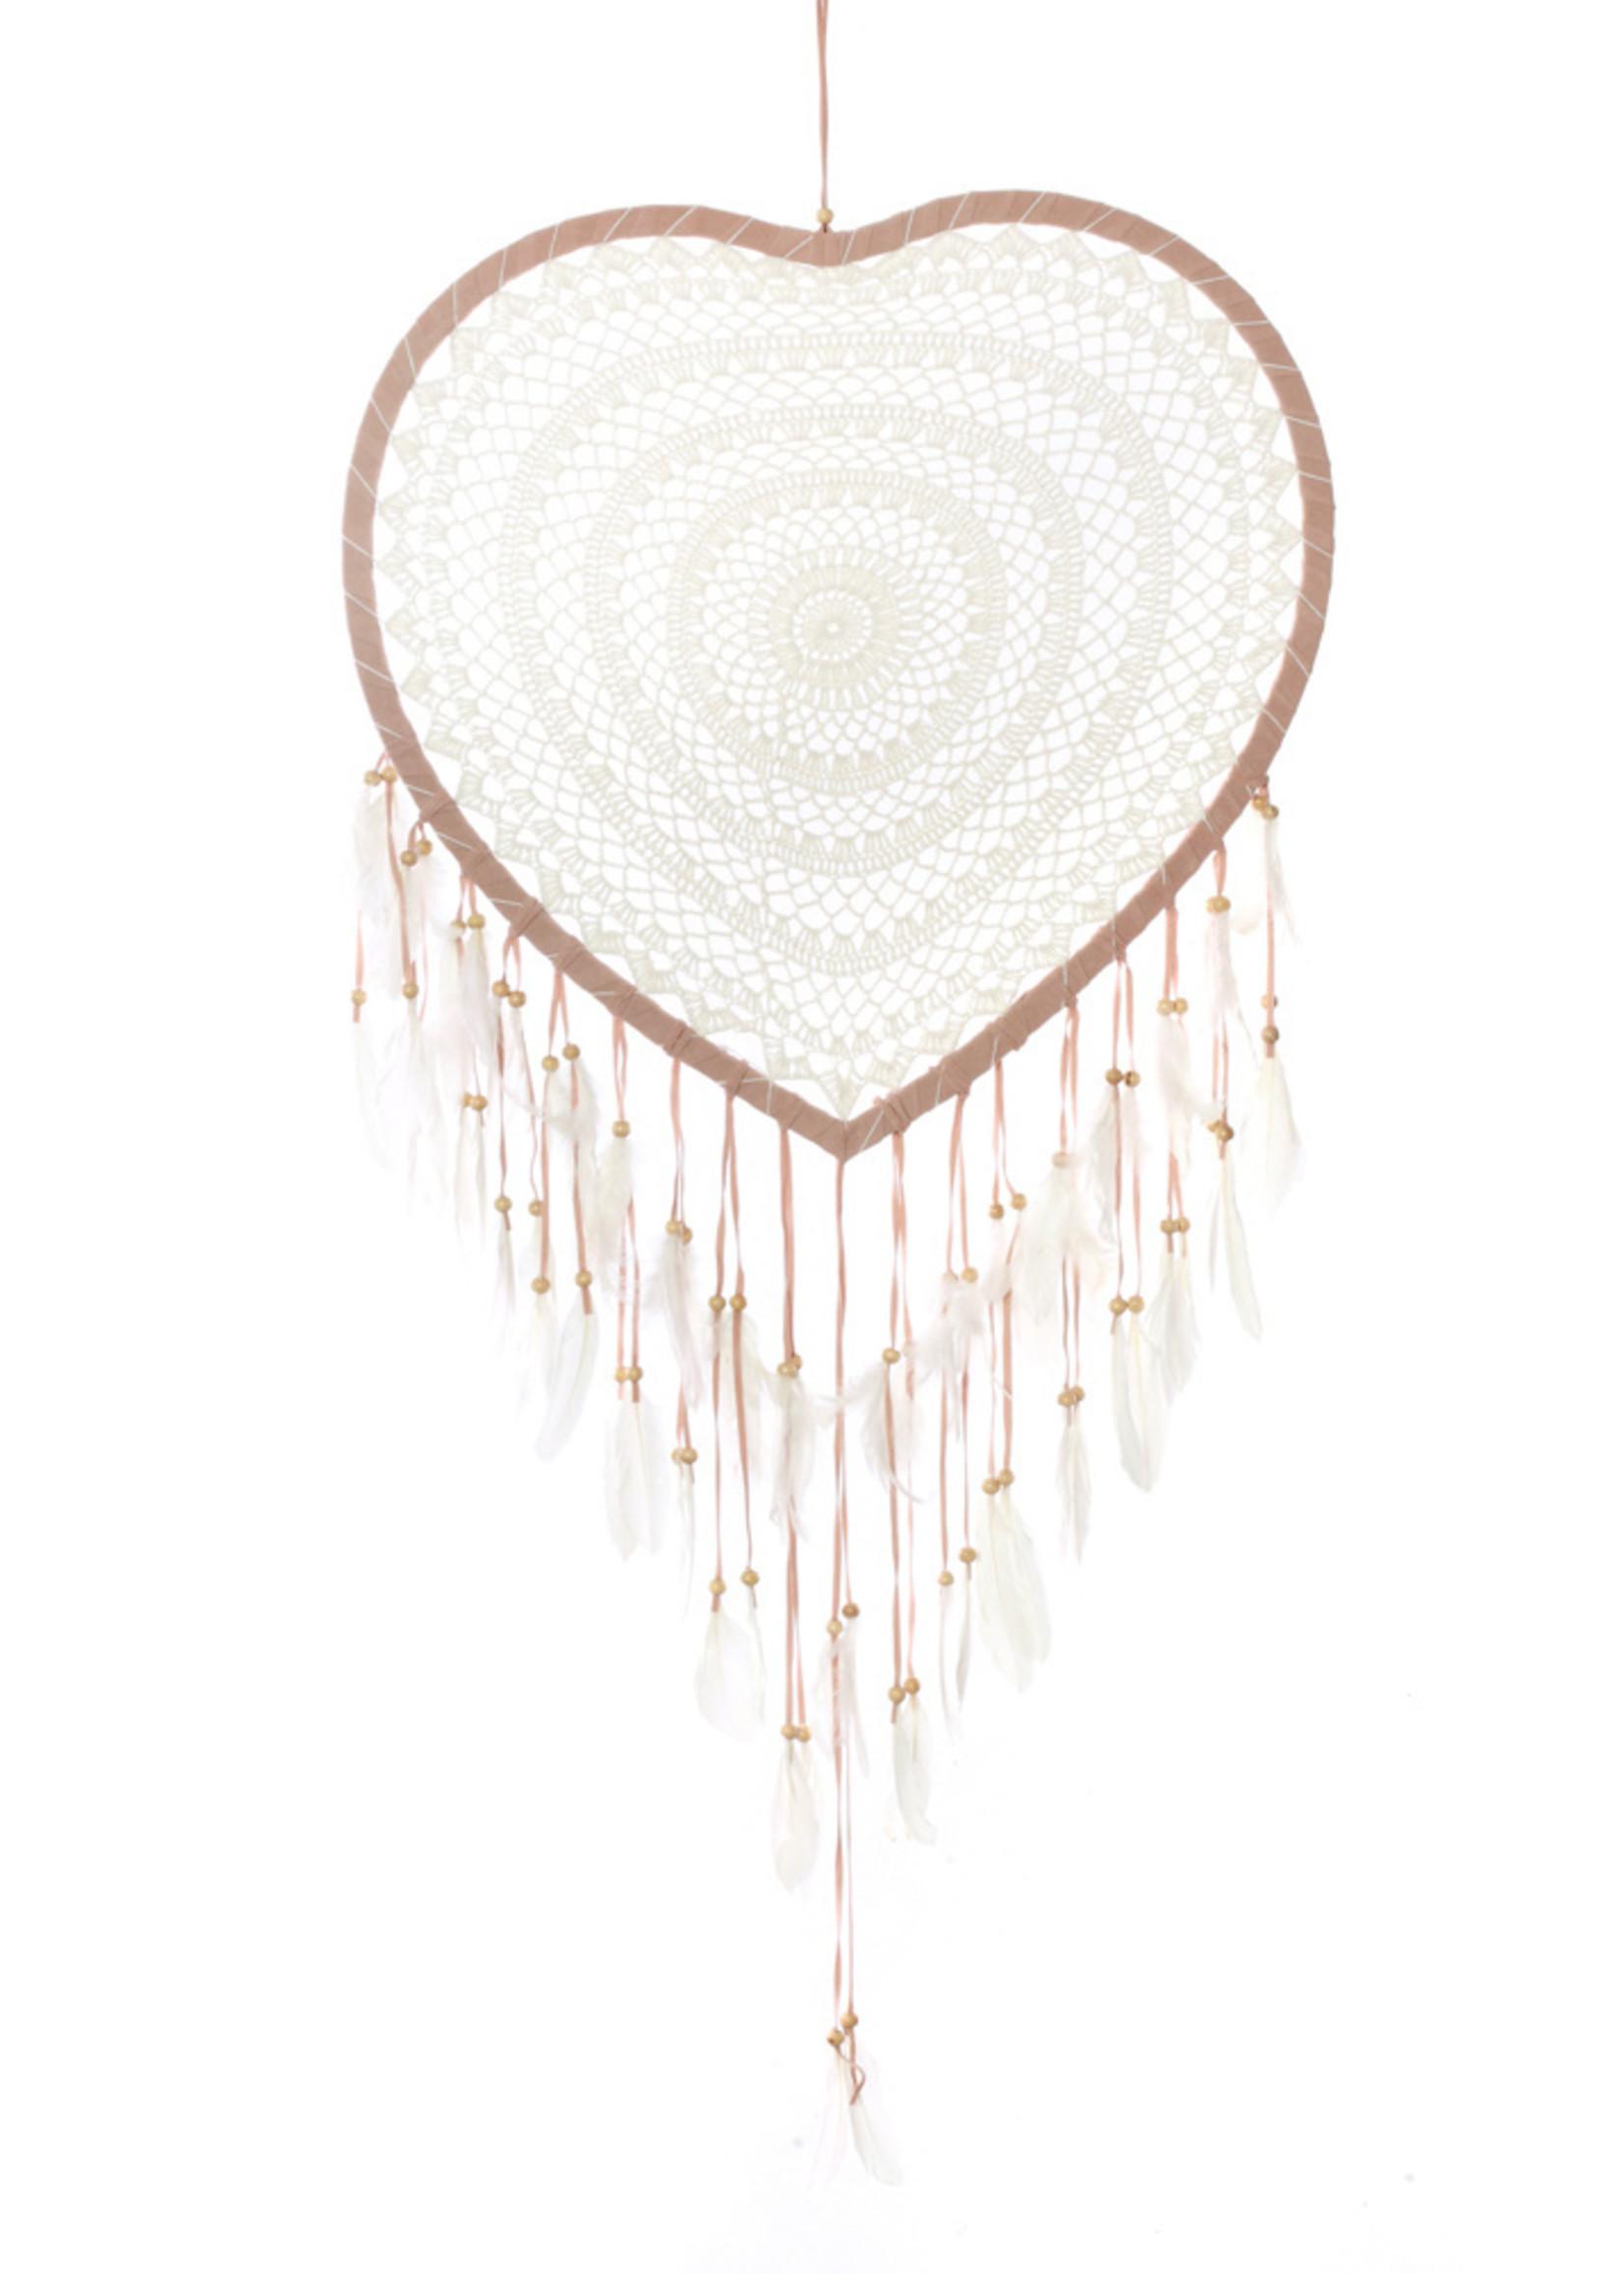 The Crochet Heart - Cream